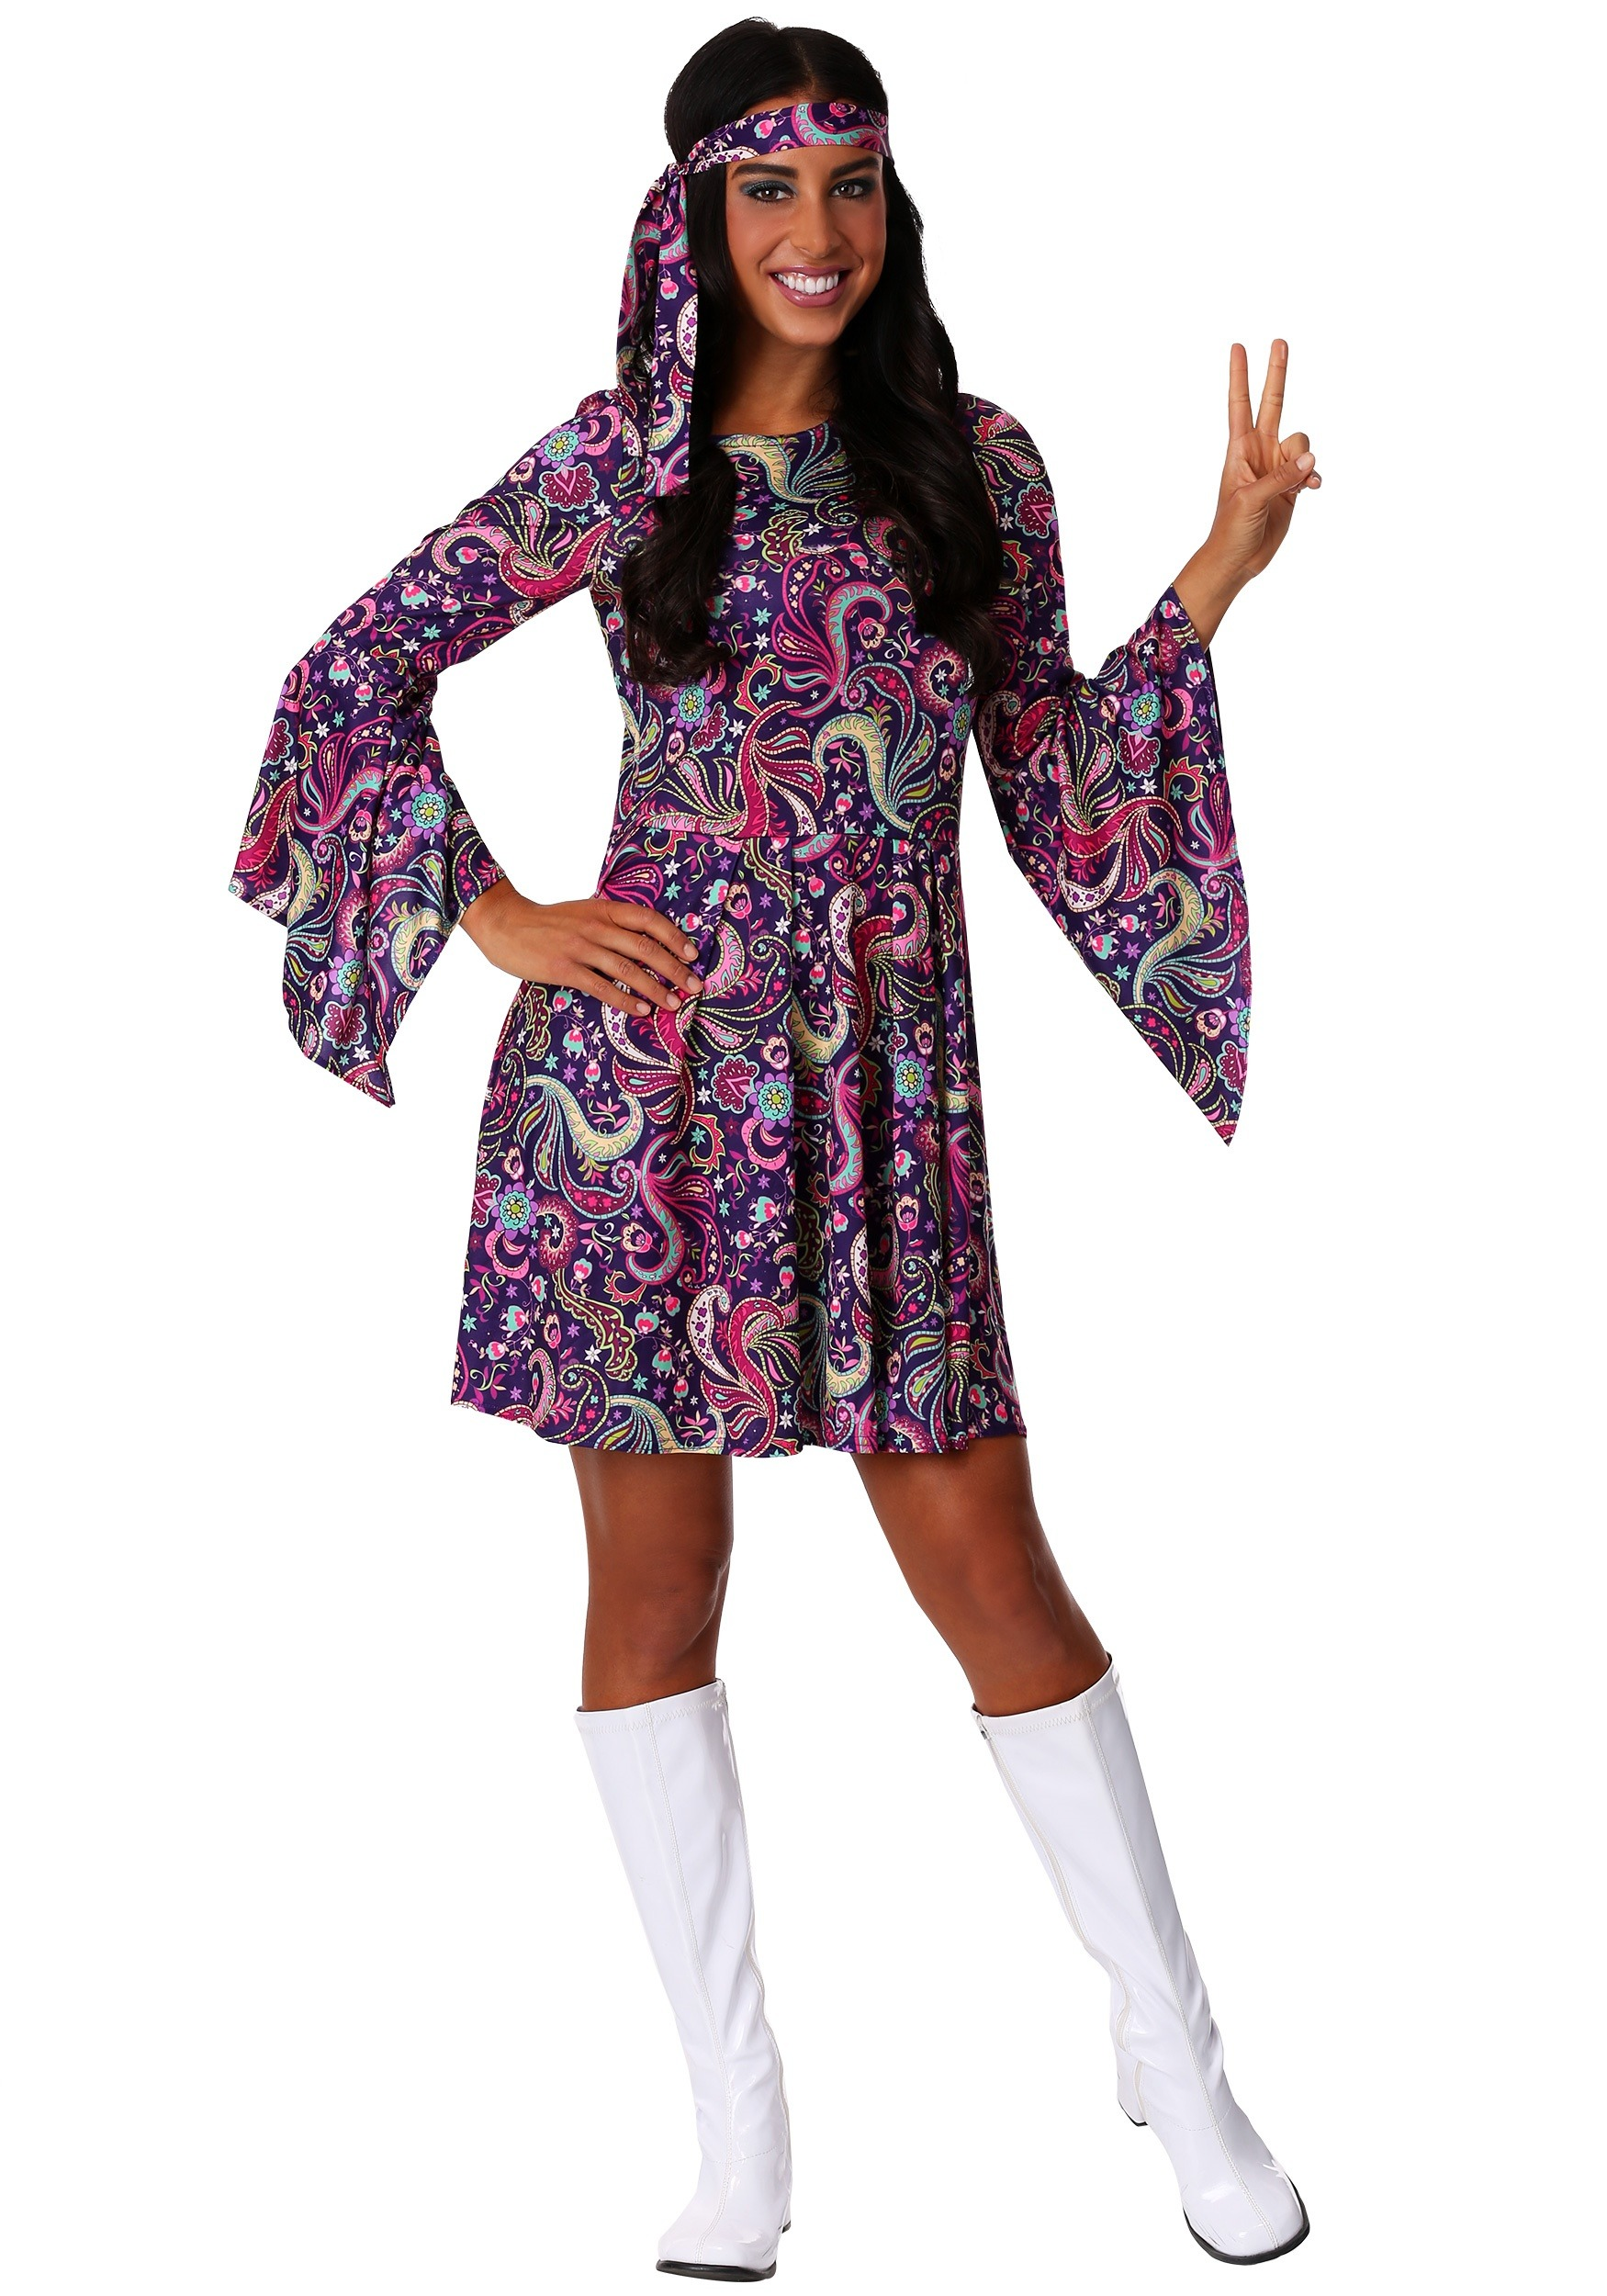 Woodstock Hippie Womens Costume